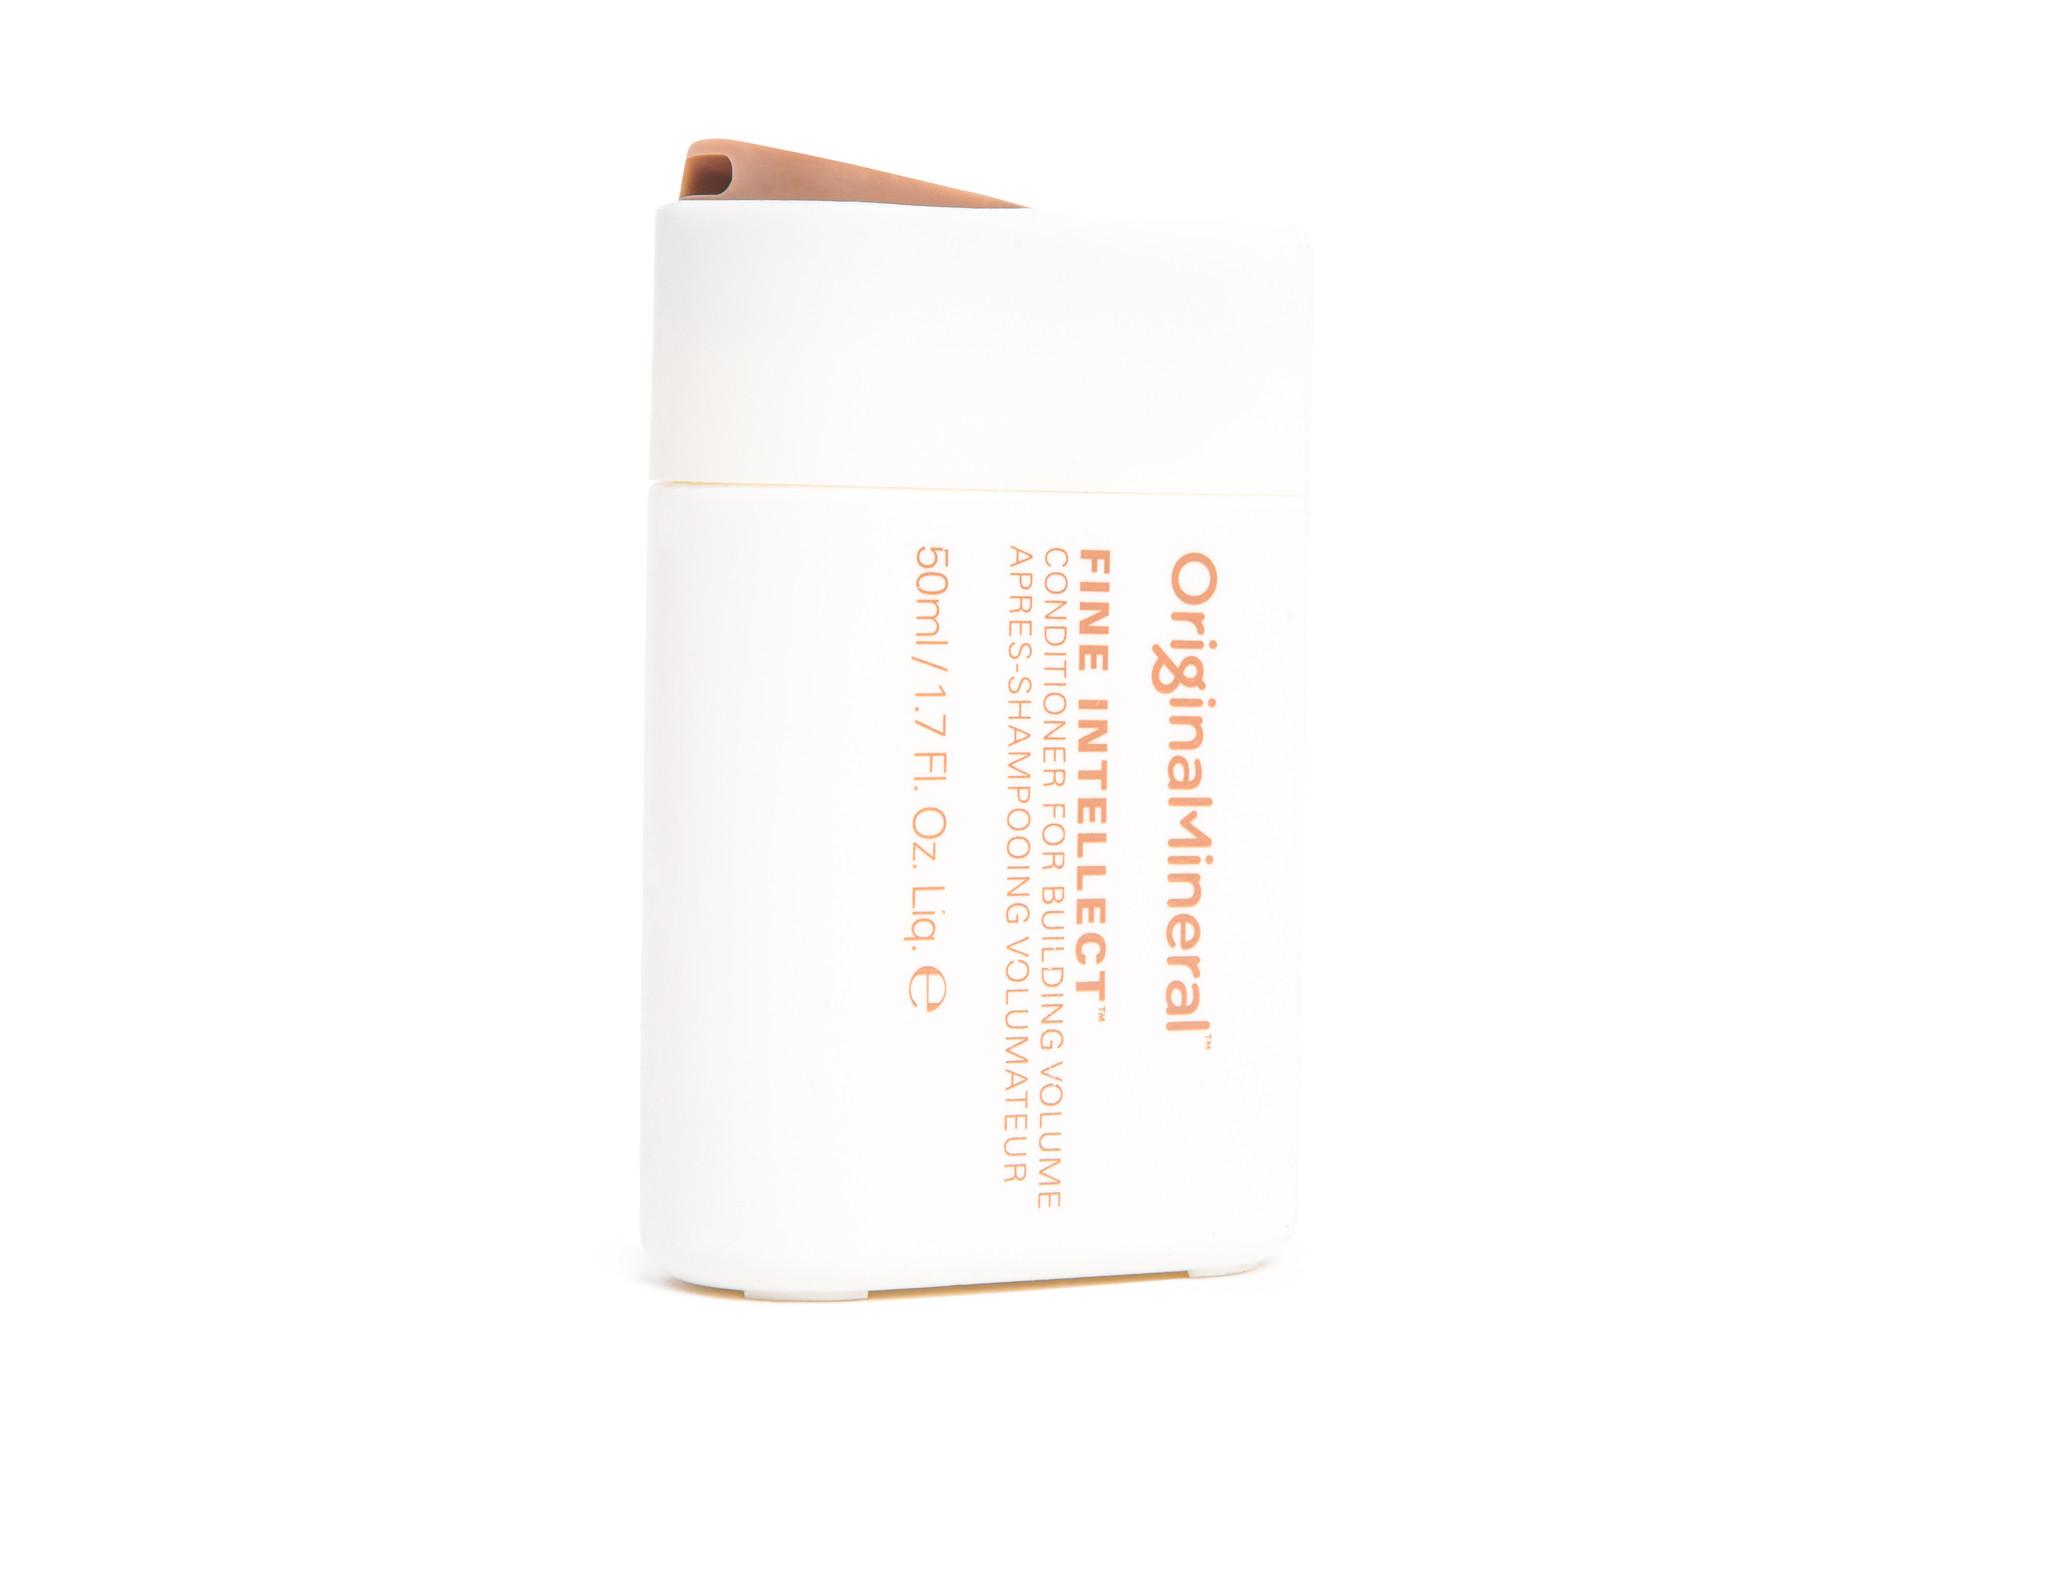 O&M - Original Mineral O&M Fine Intellect Après-Shampooing Volumisant - 50ml